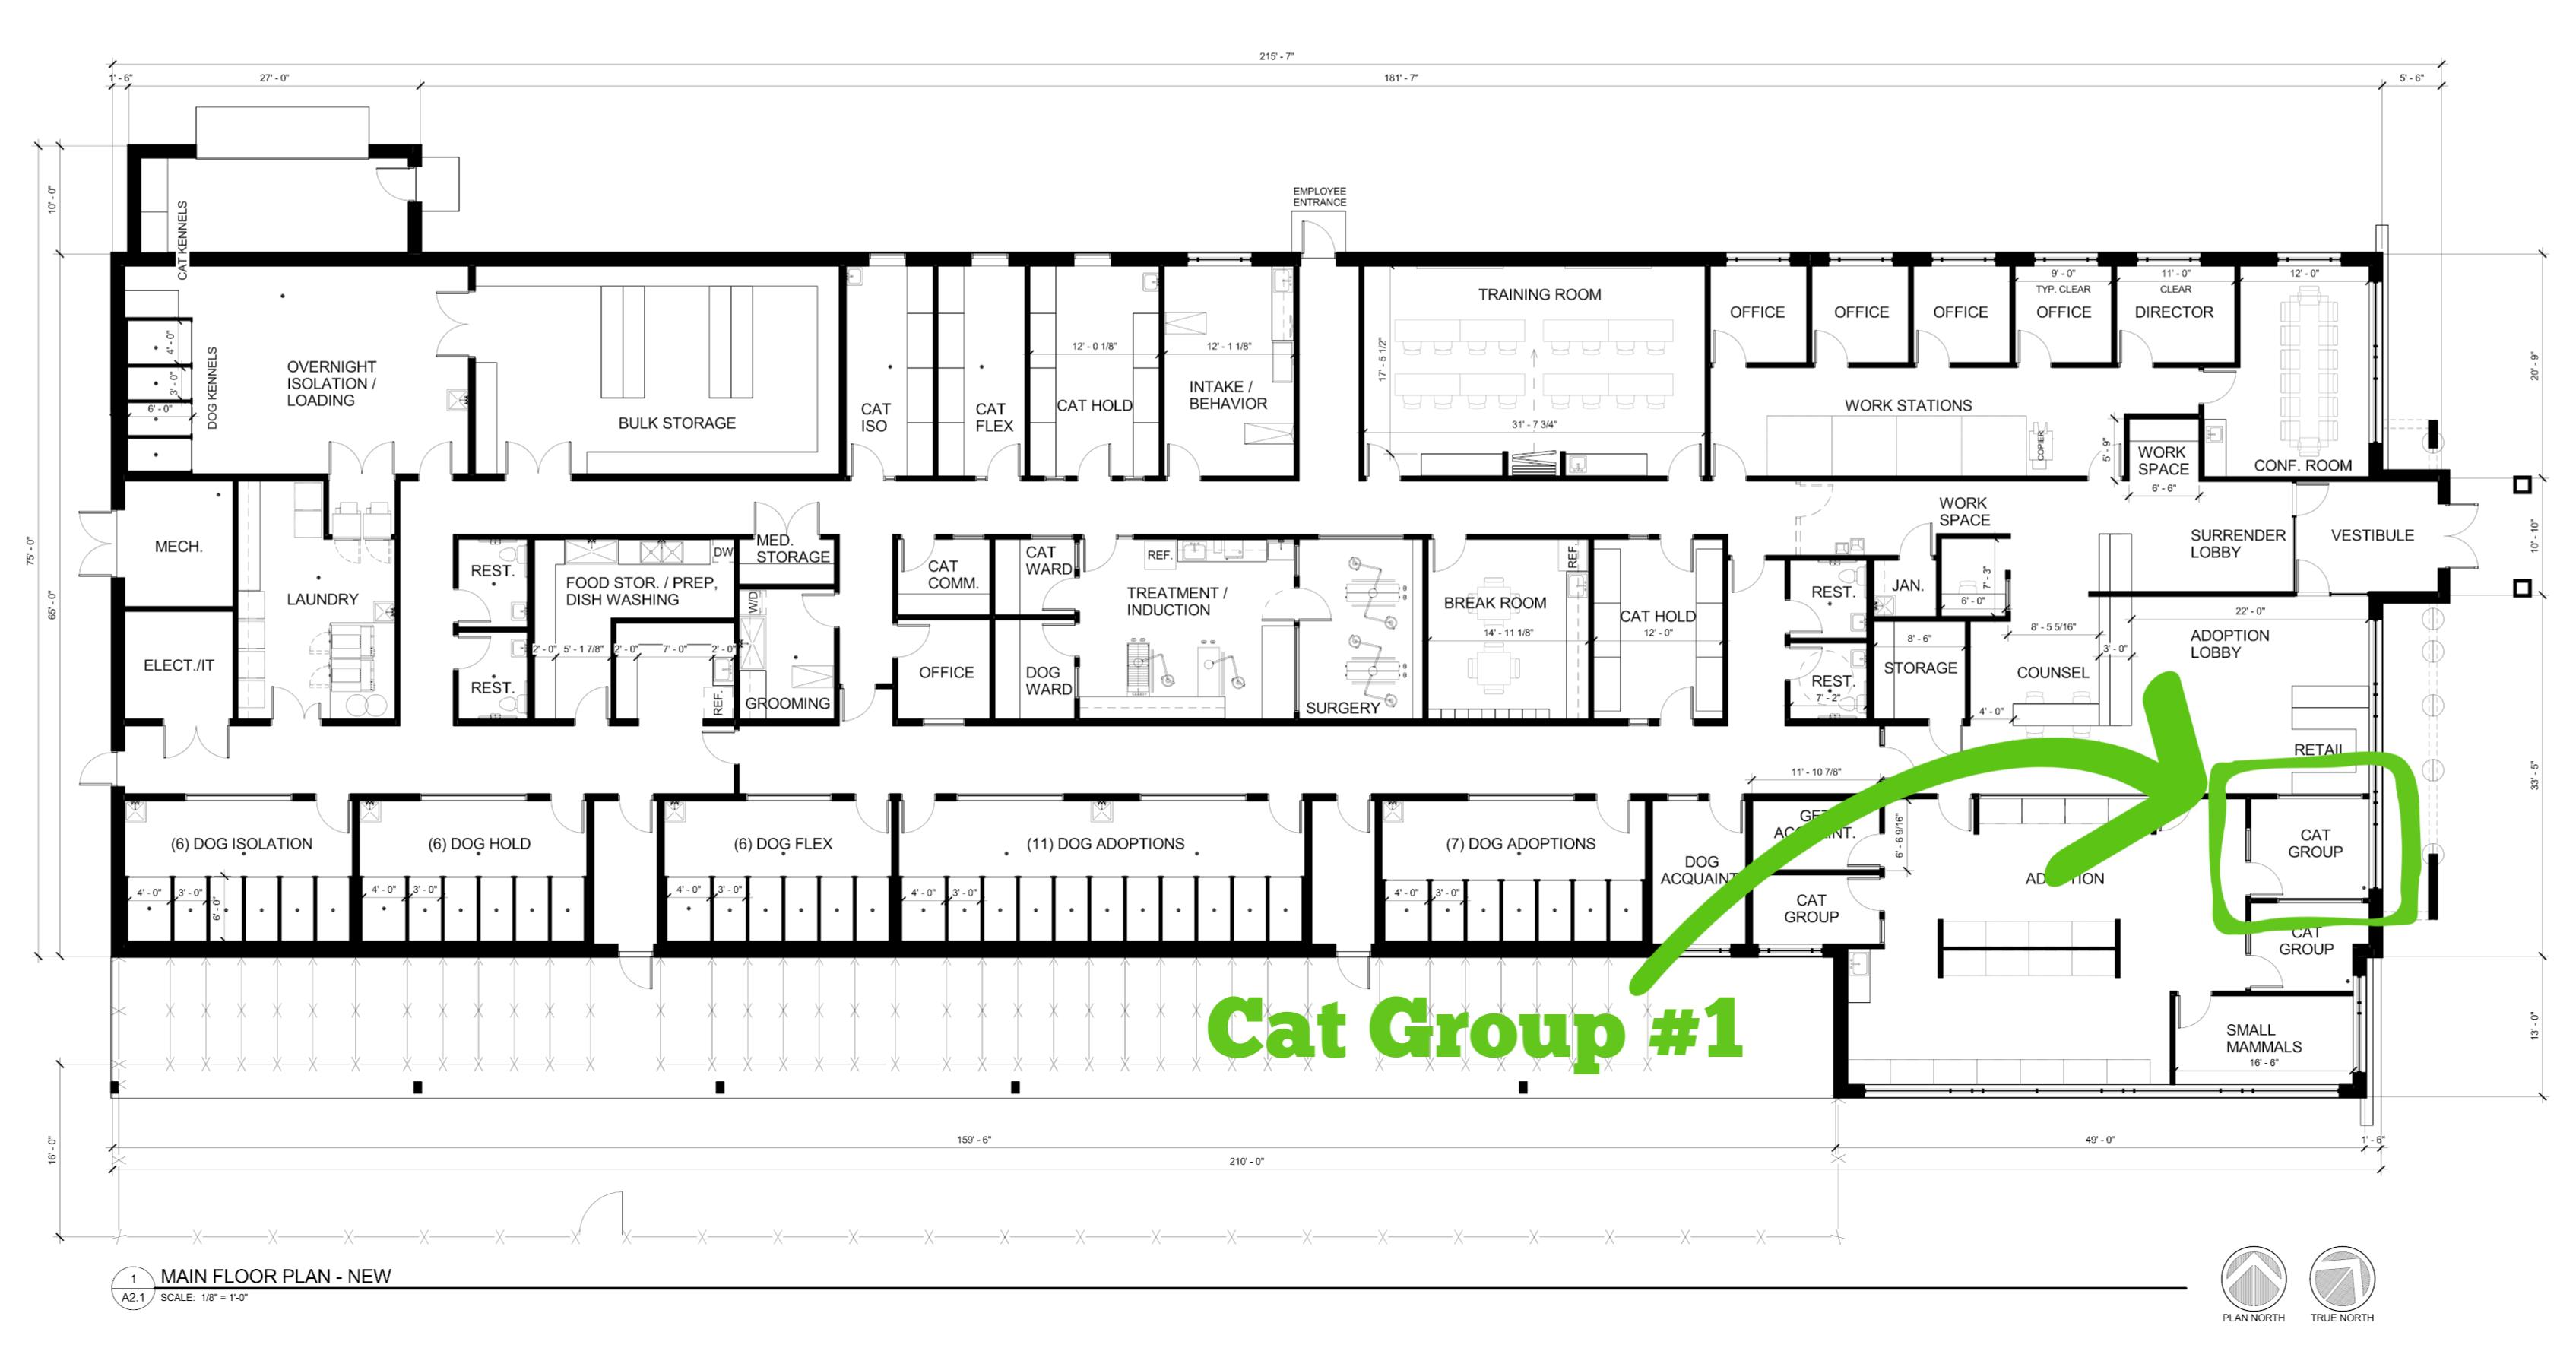 Cat Group #1